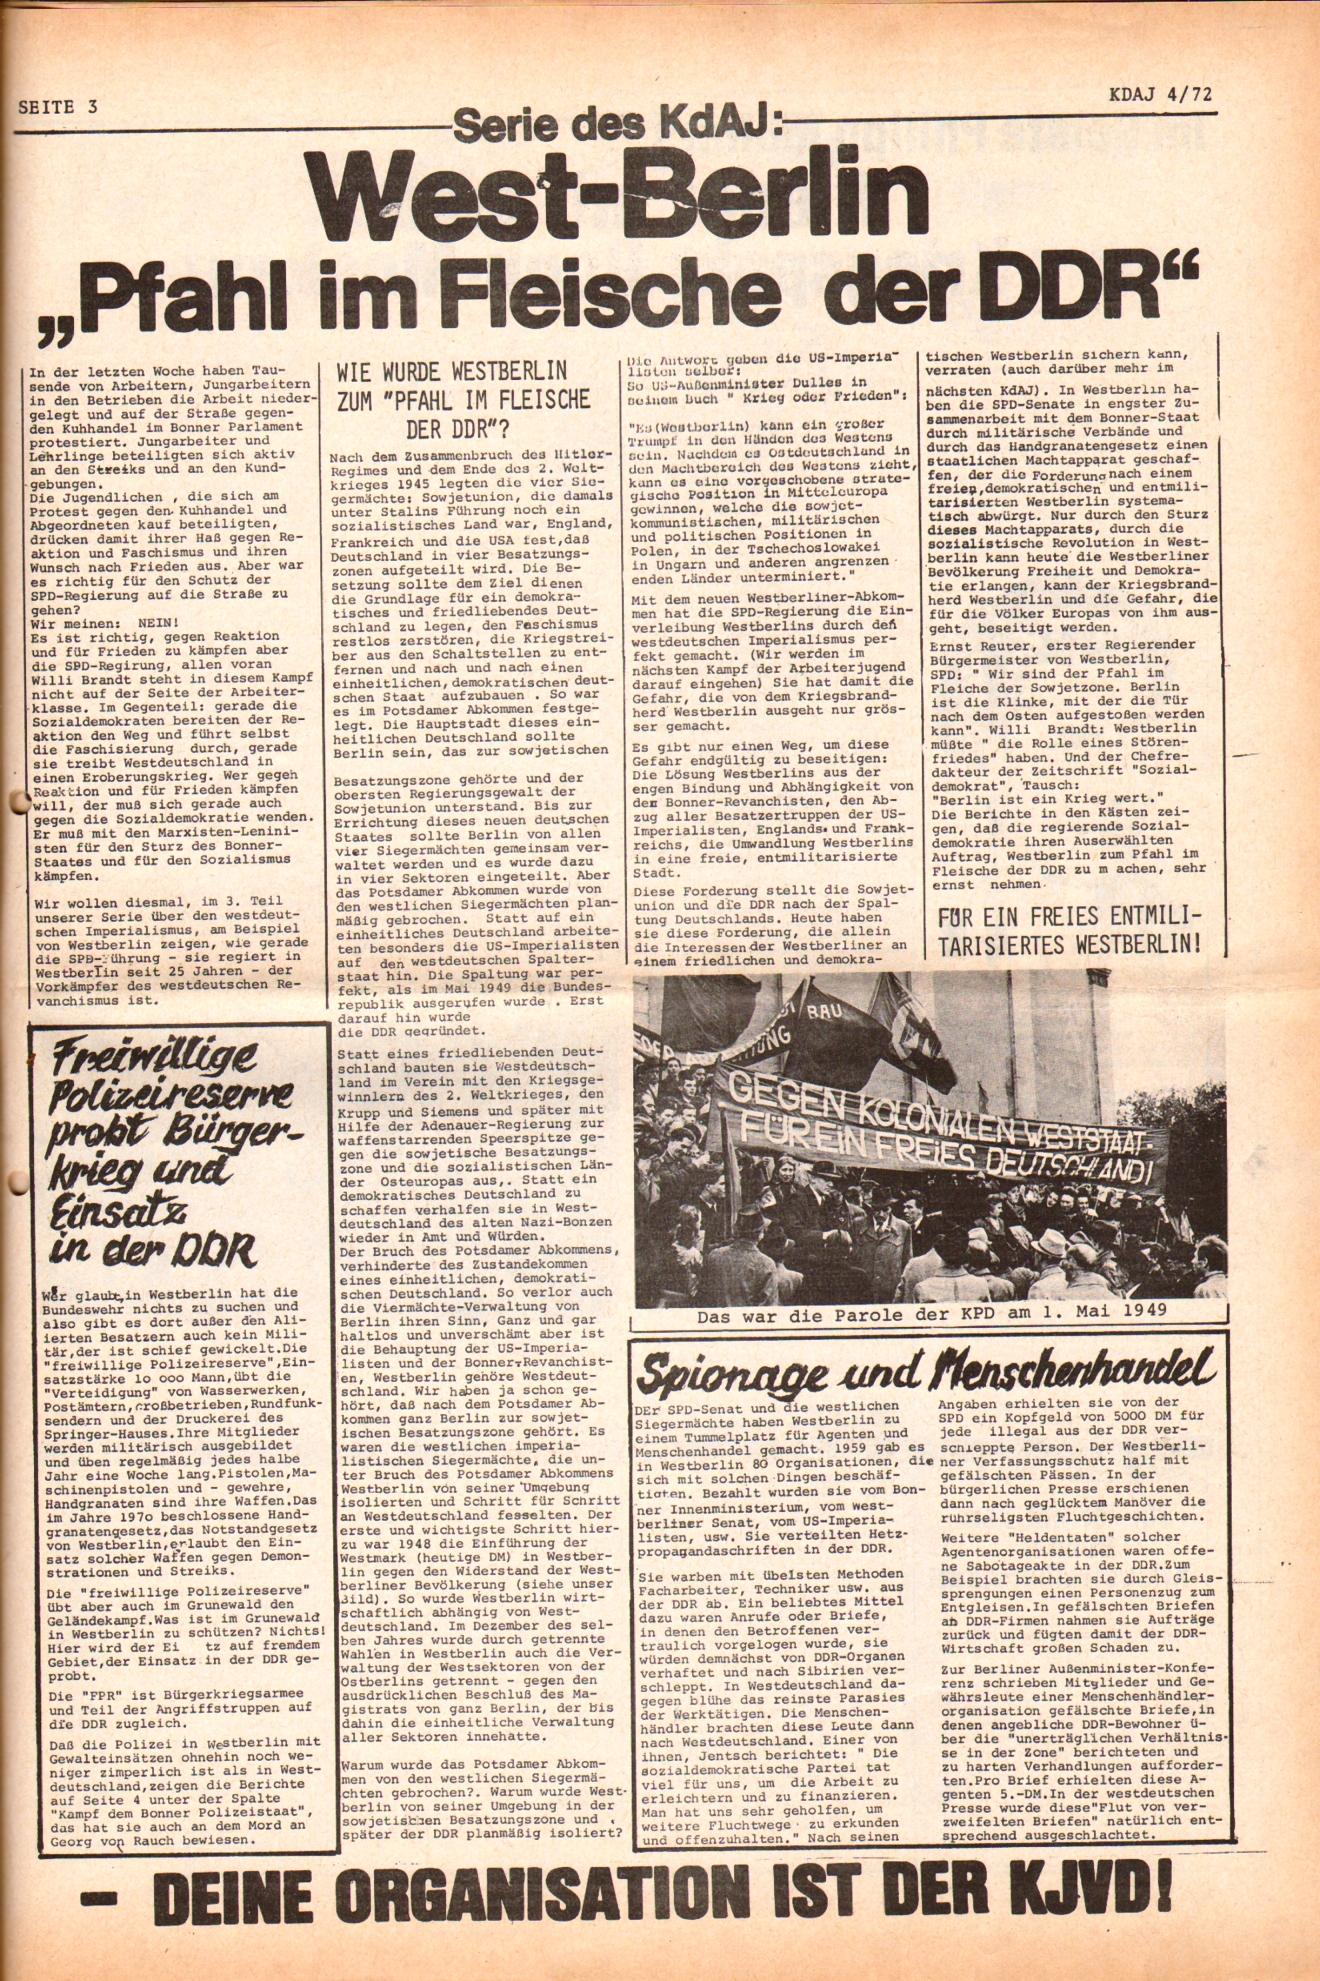 KDAJ, 3. Jg., Mai 1972, Nr. 4, Seite 3